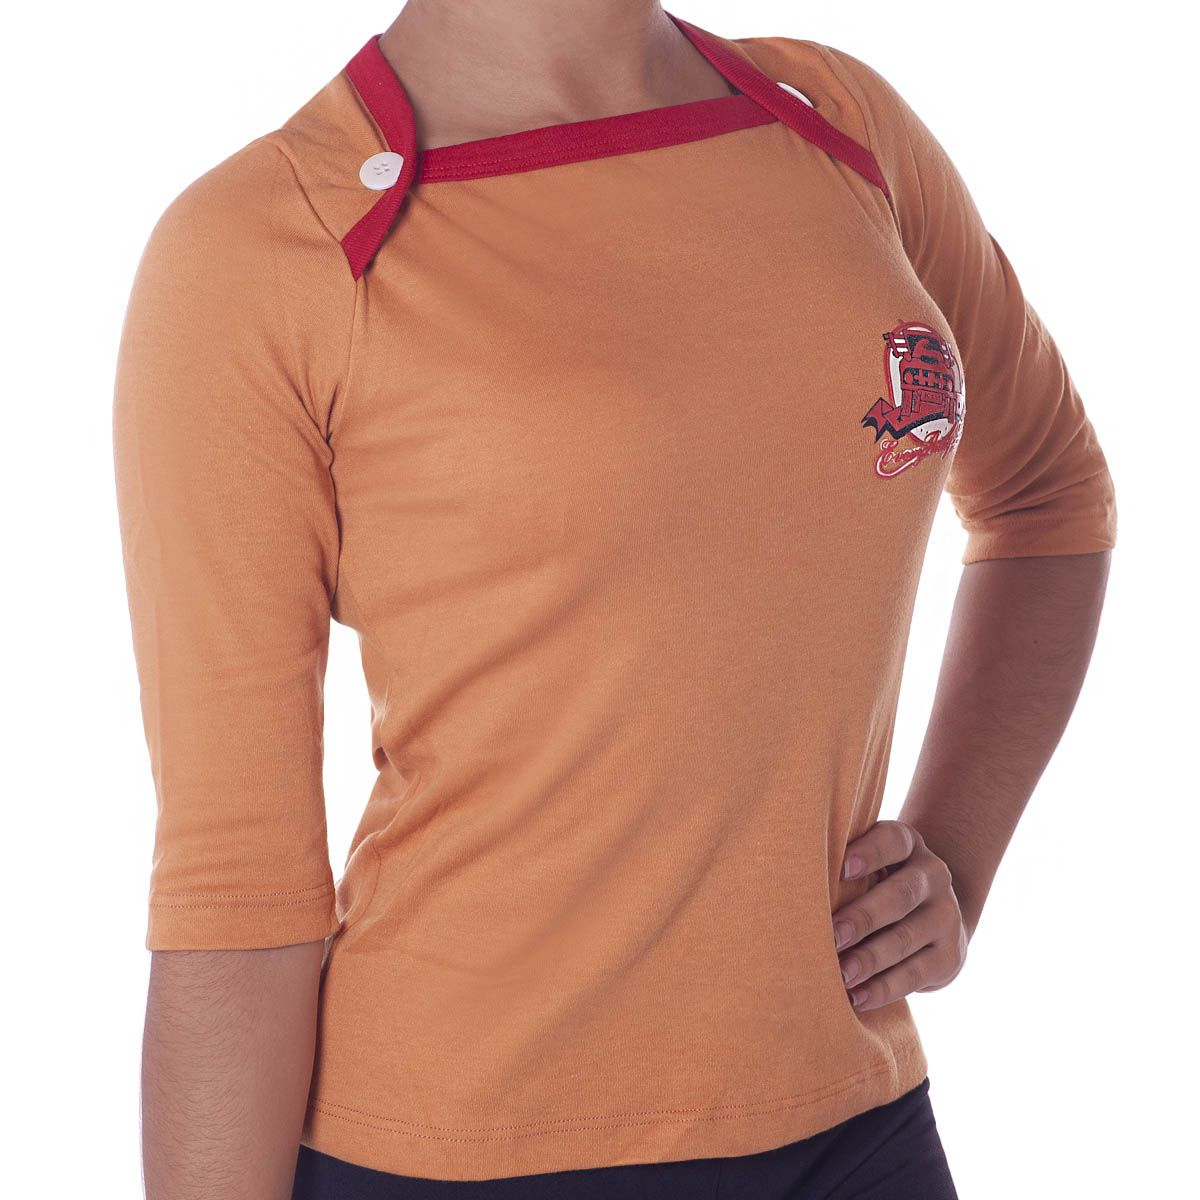 Camiseta Feminina First Class  -